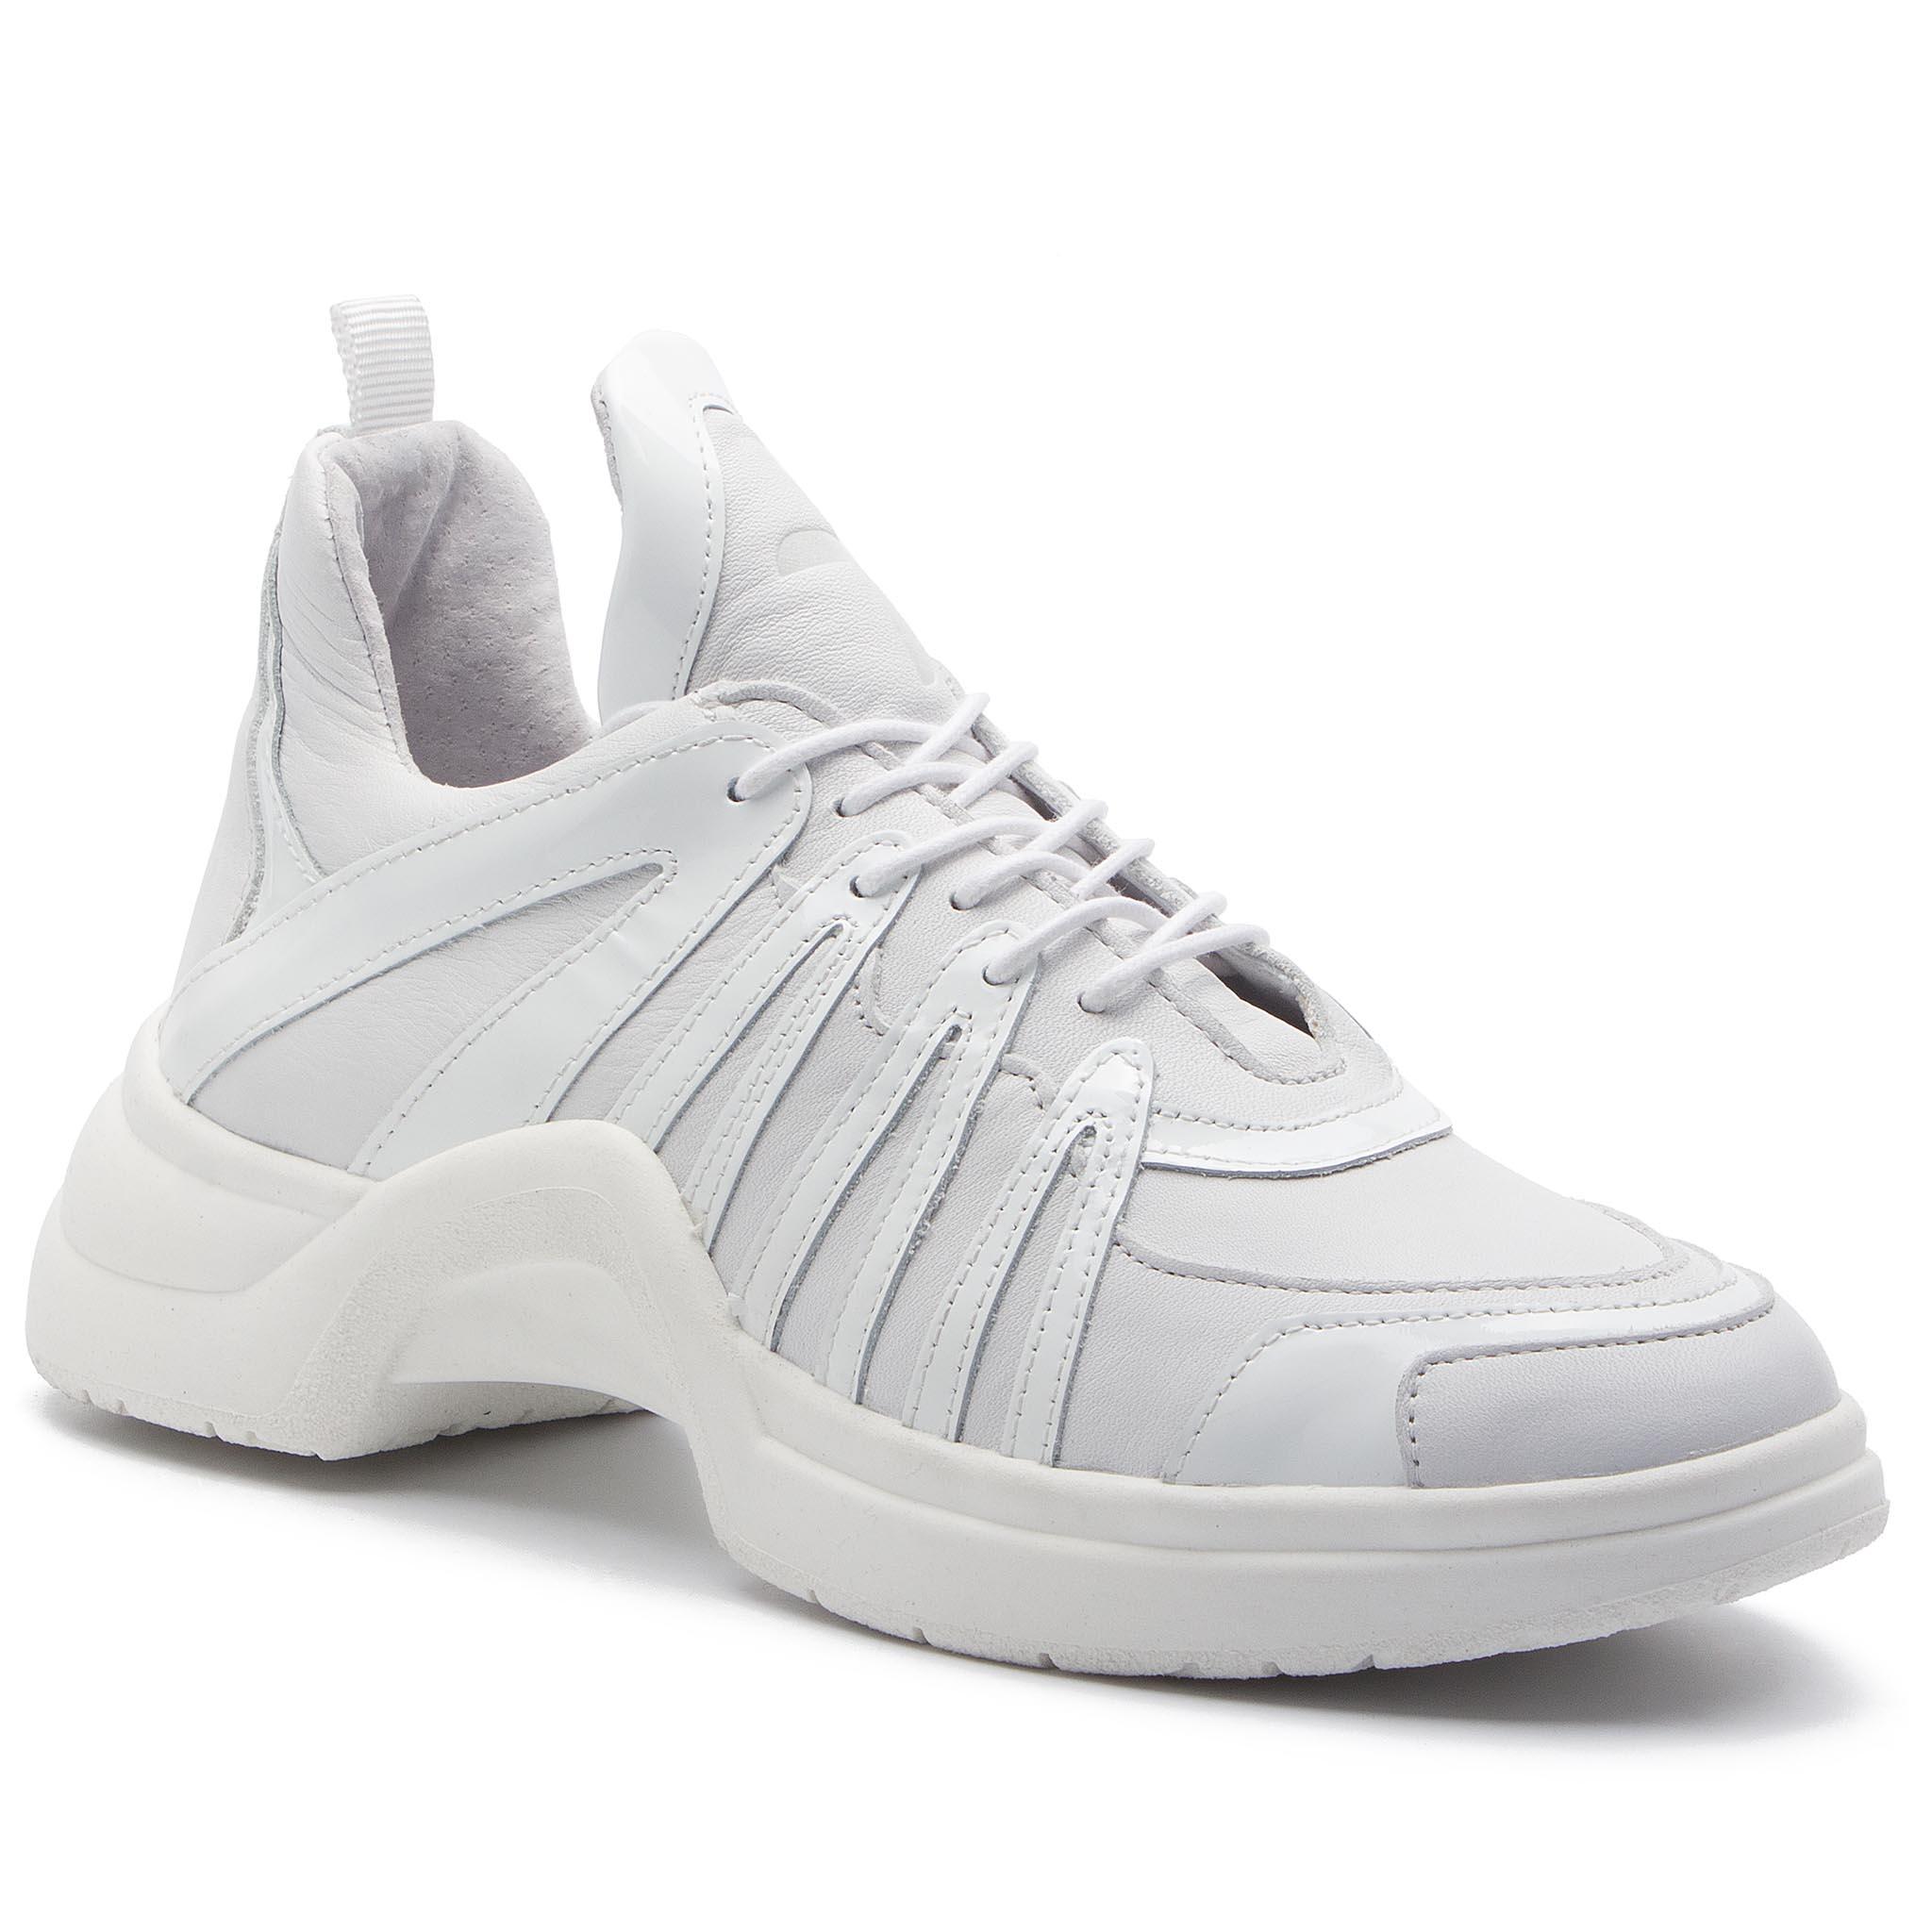 000060 Tg Low Sneakers Togoshi 11 112 Shoes 02 KlcF1T3uJ